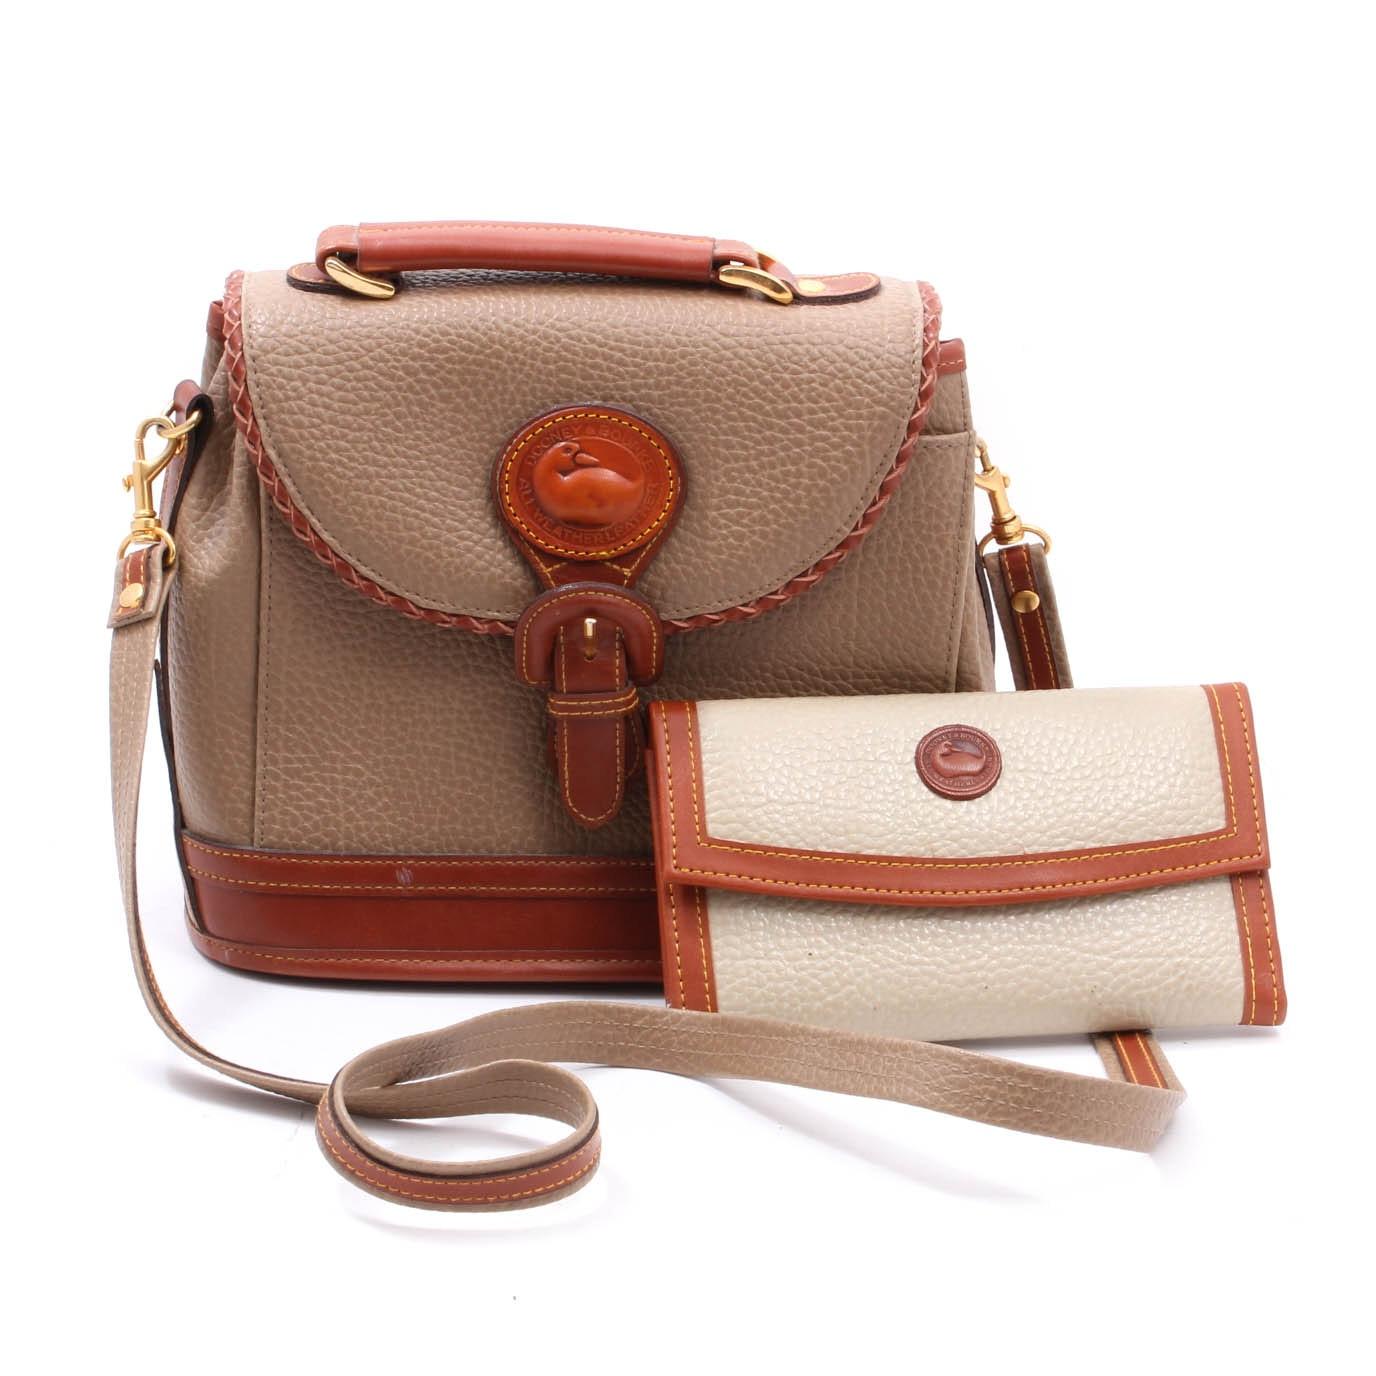 Dooney & Bourke Tan All-Weather Leather Saddle Handbag and Wallet